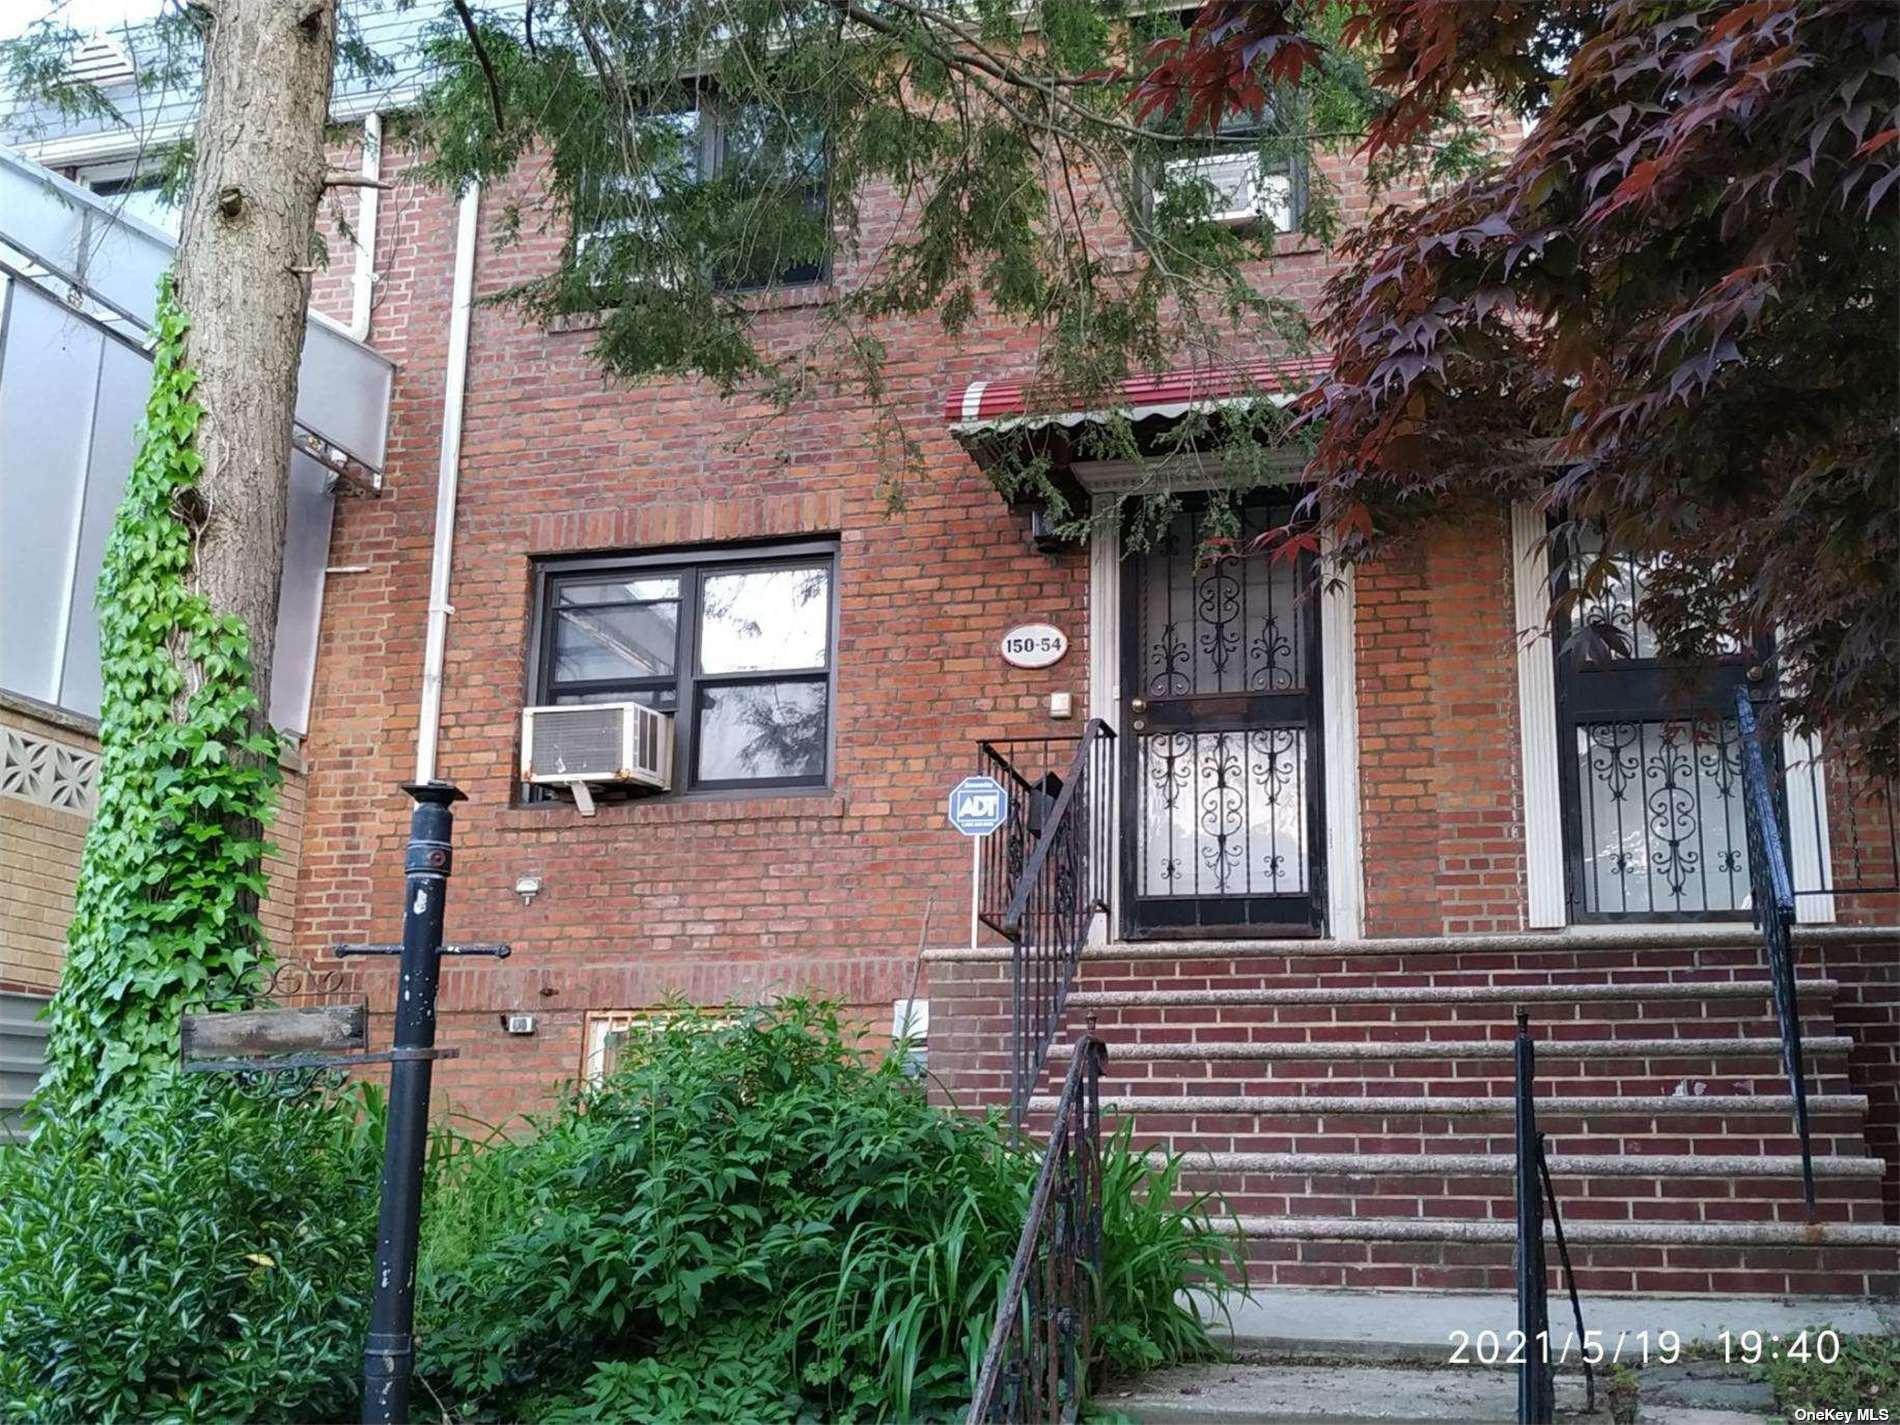 15054 77 Ave, Flushing, NY 11367 - MLS#: 3320219